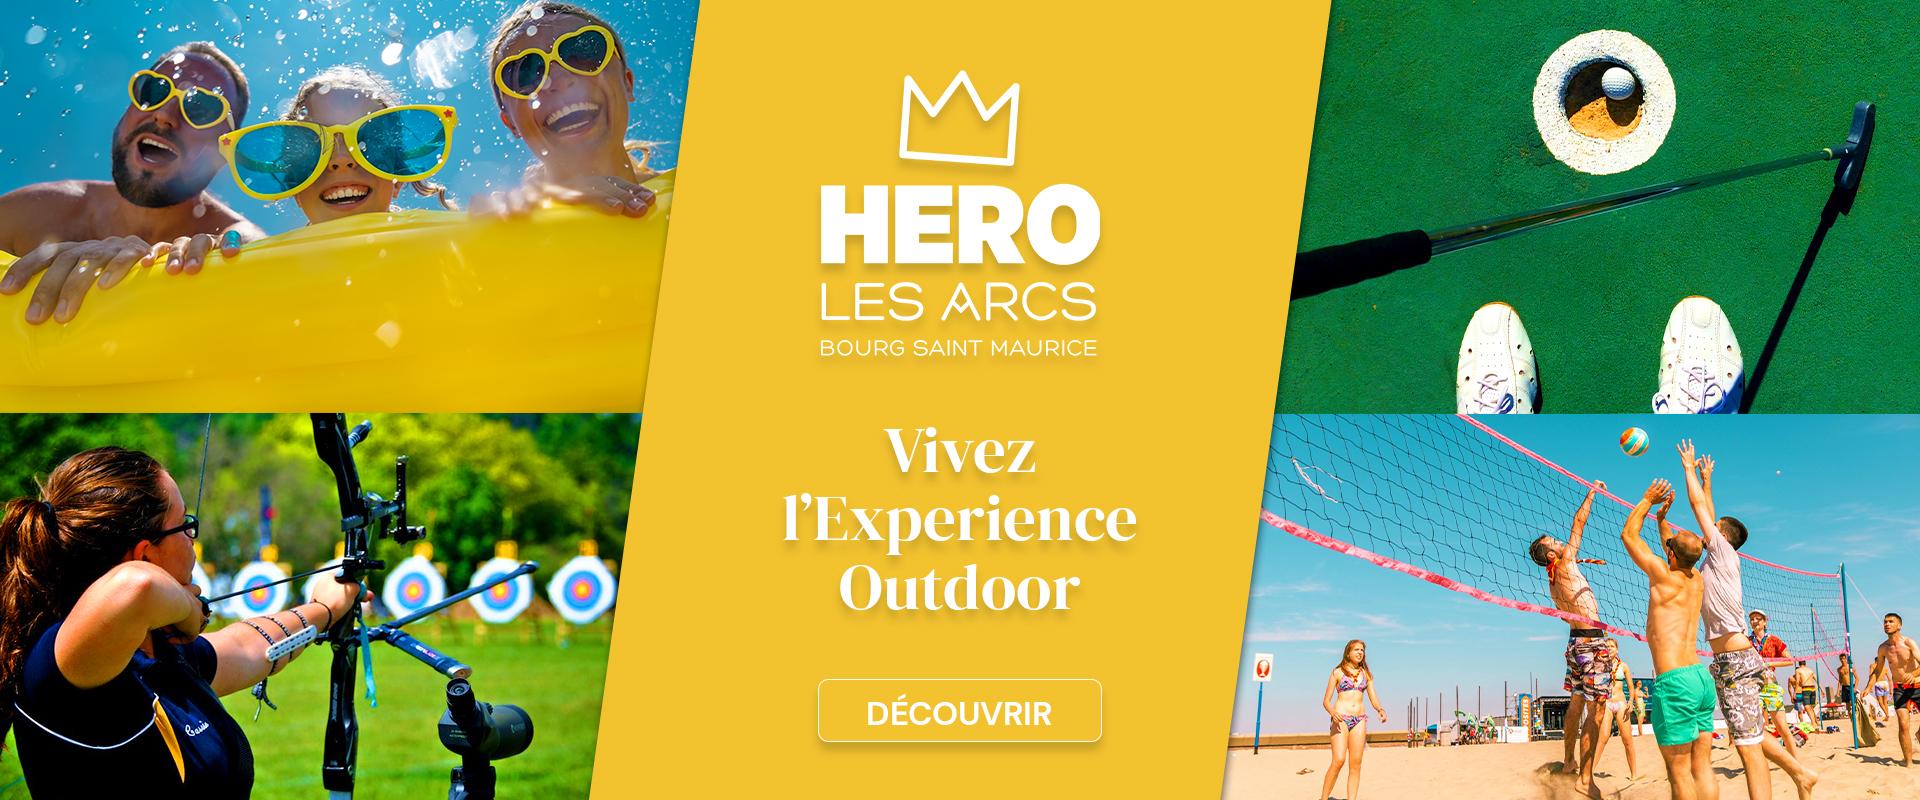 HERO Pass Les Arcs